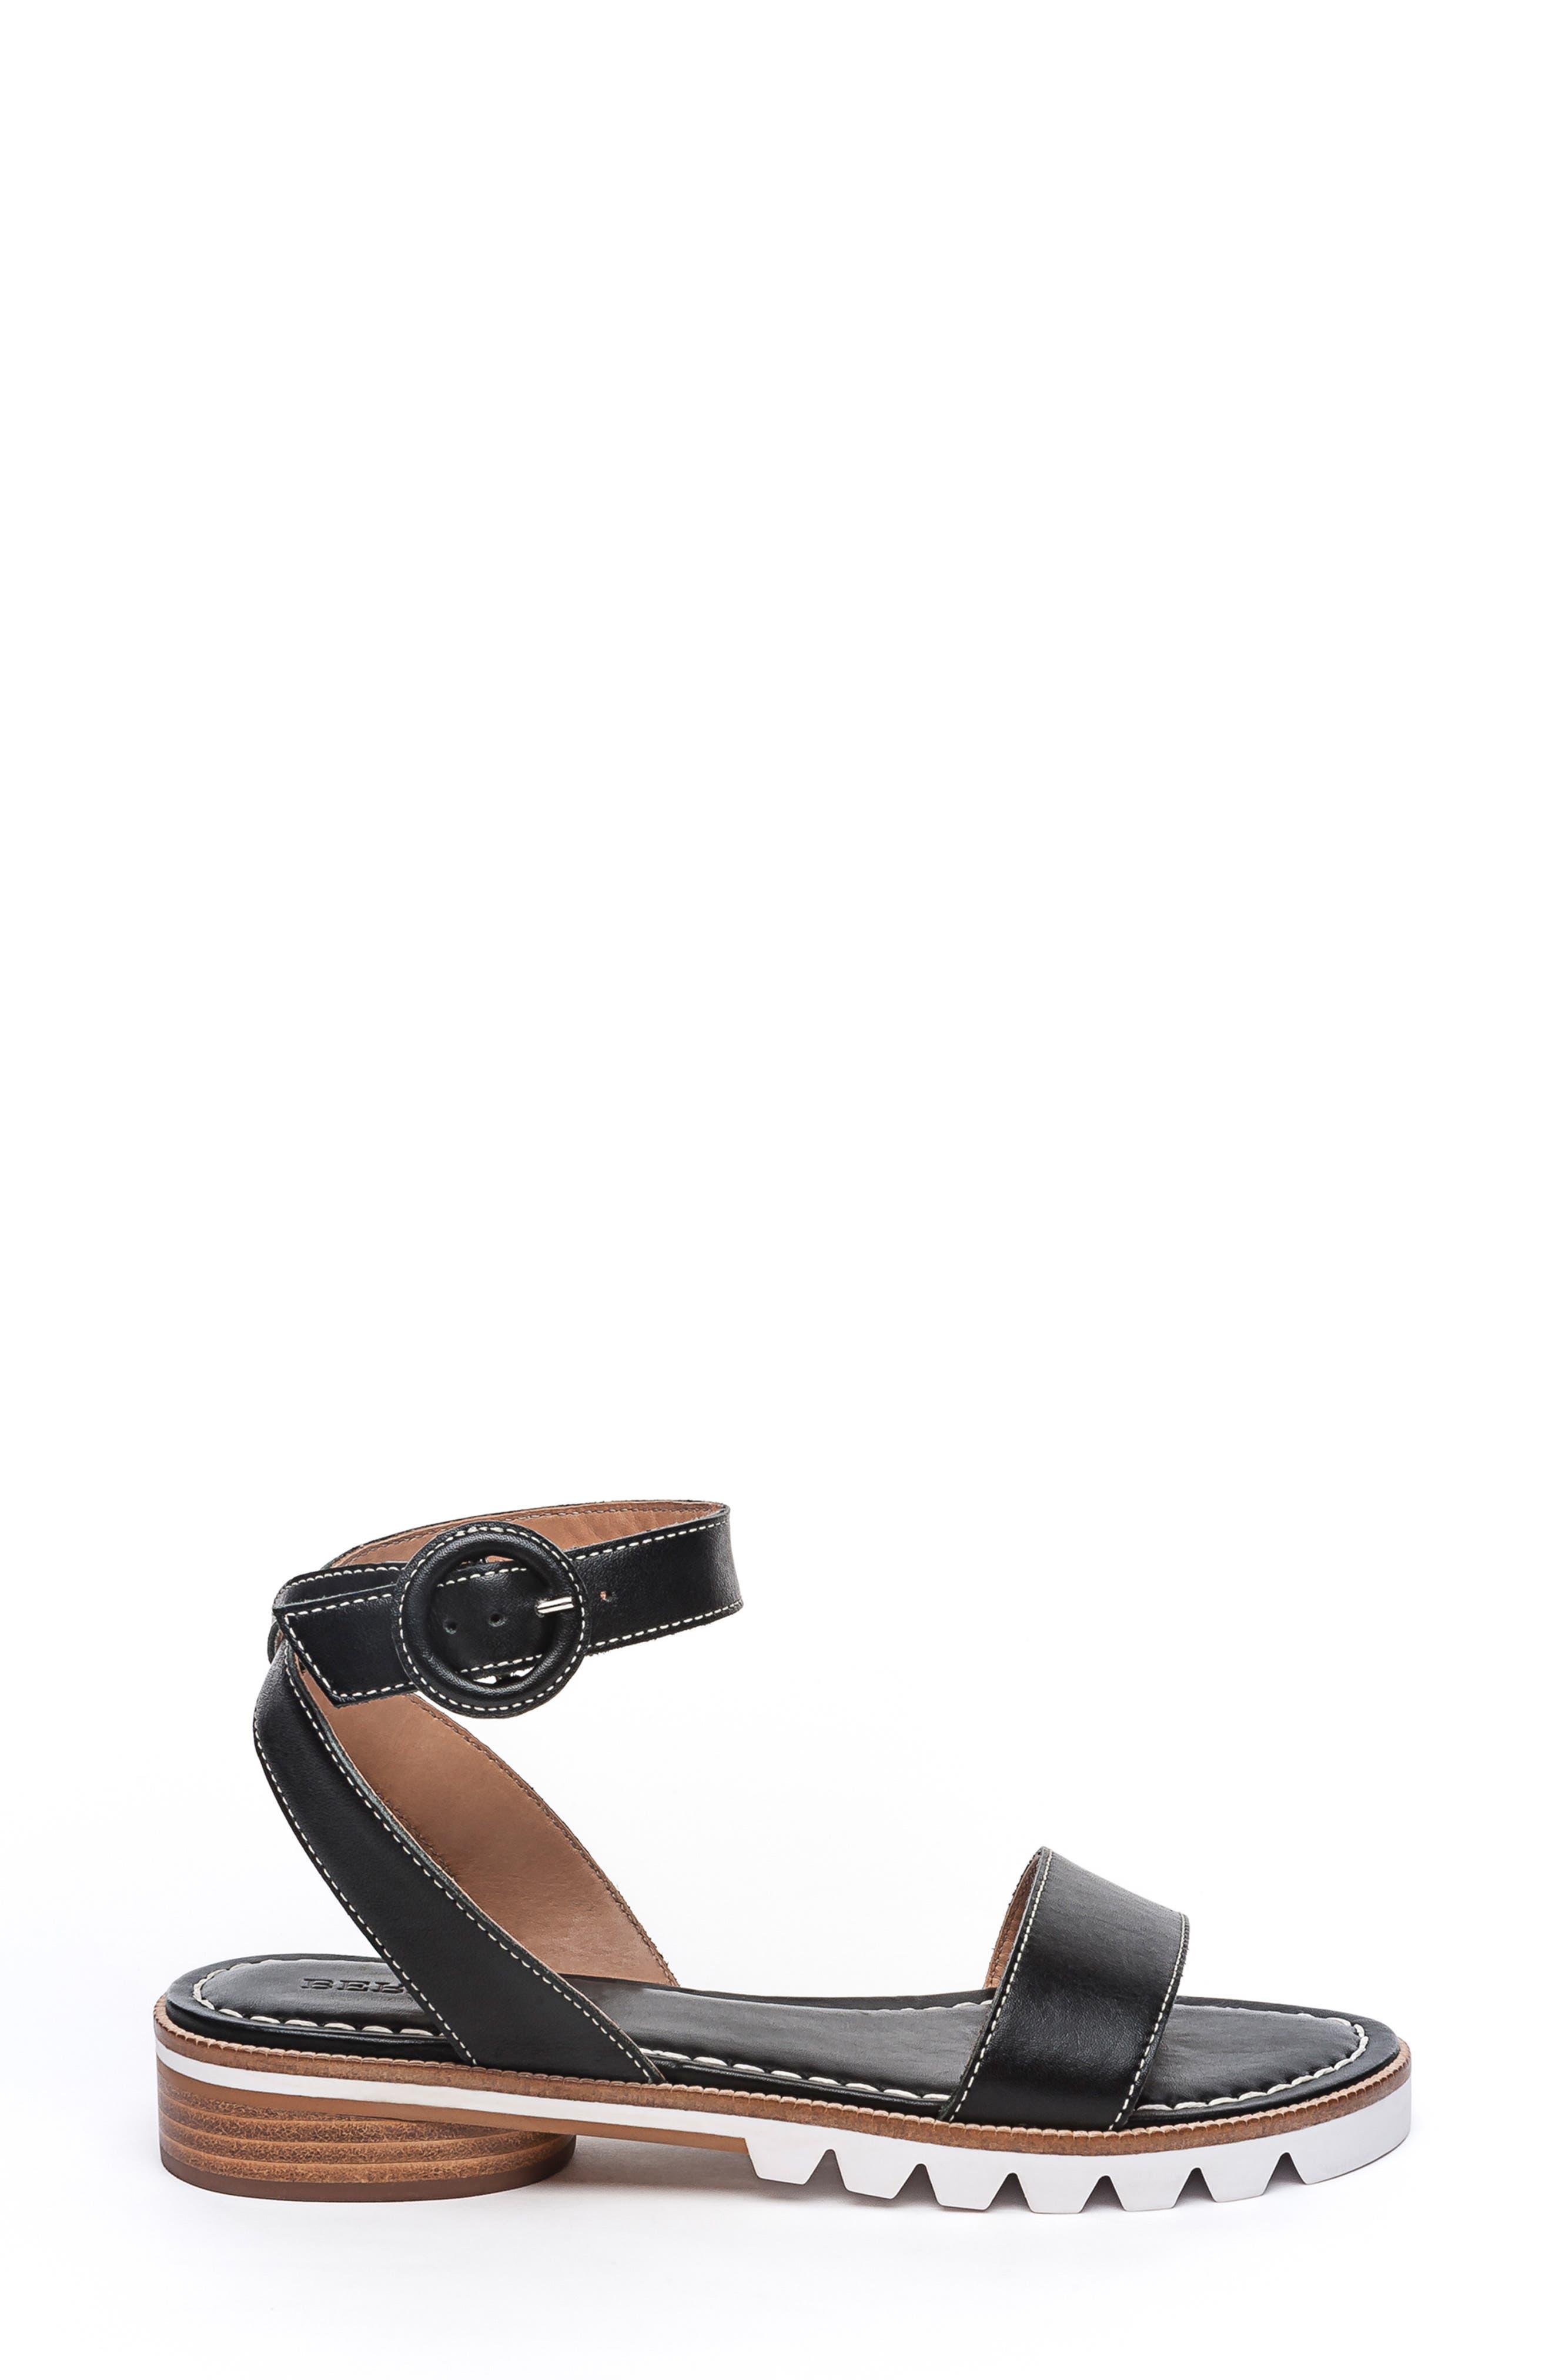 BERNARDO, Footwear Alexis Ankle Strap Sandal, Alternate thumbnail 3, color, BLACK